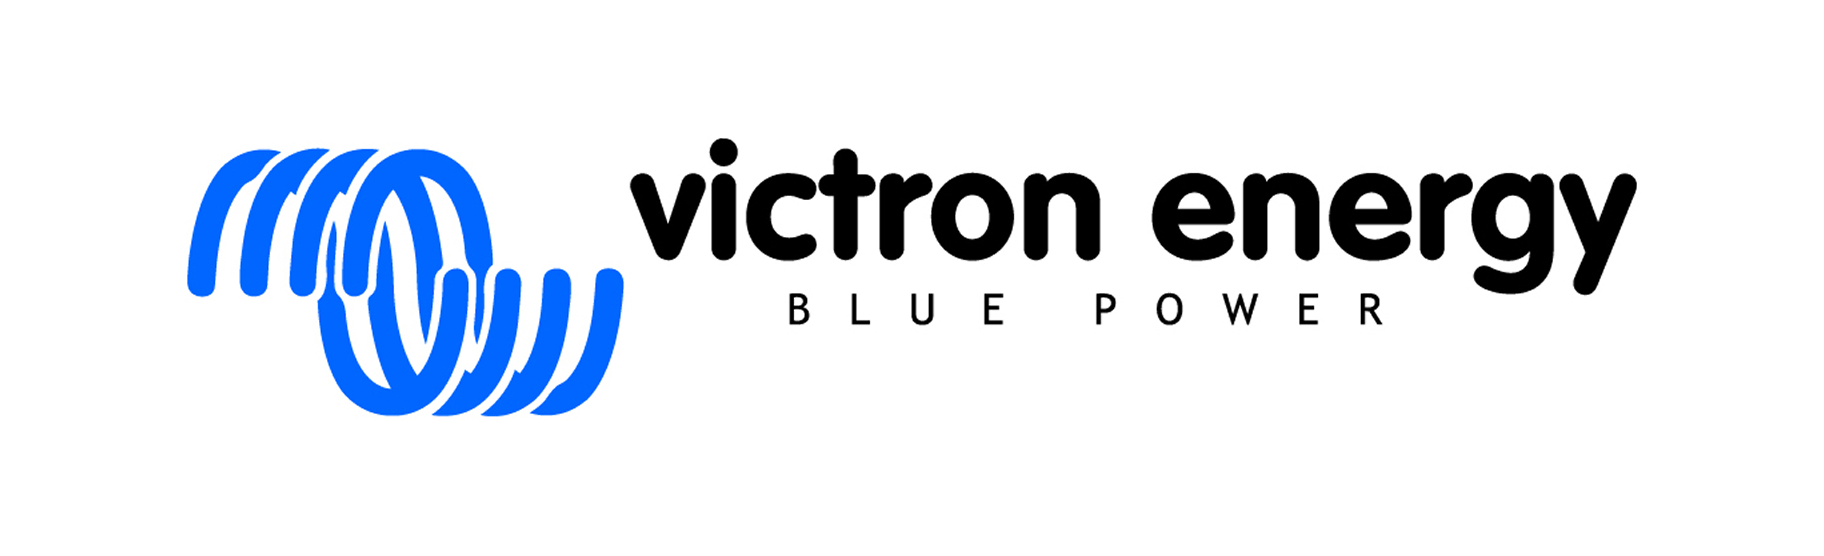 victron-energy-logo